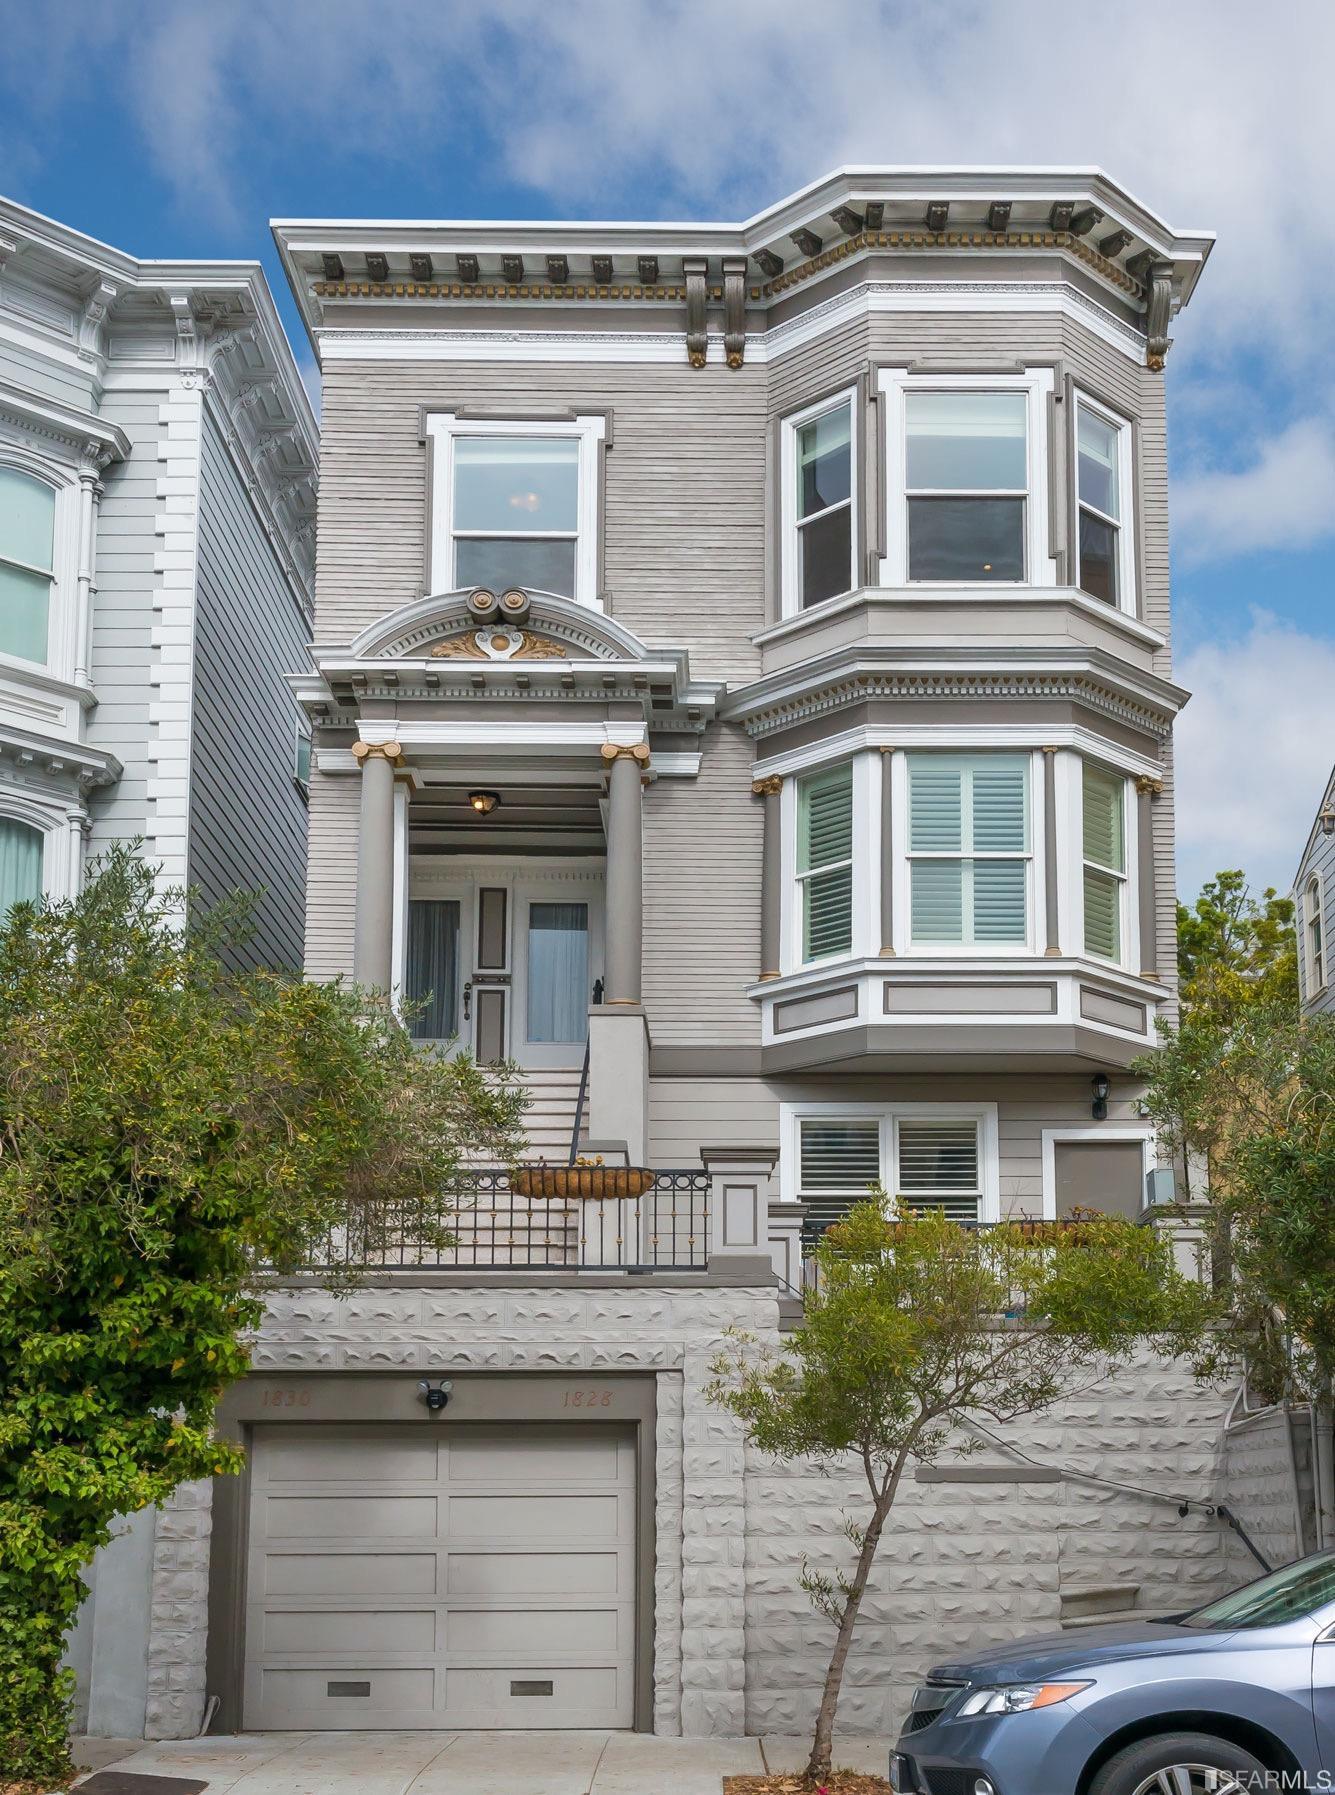 1830 Pine St, San Francisco, CA 94109